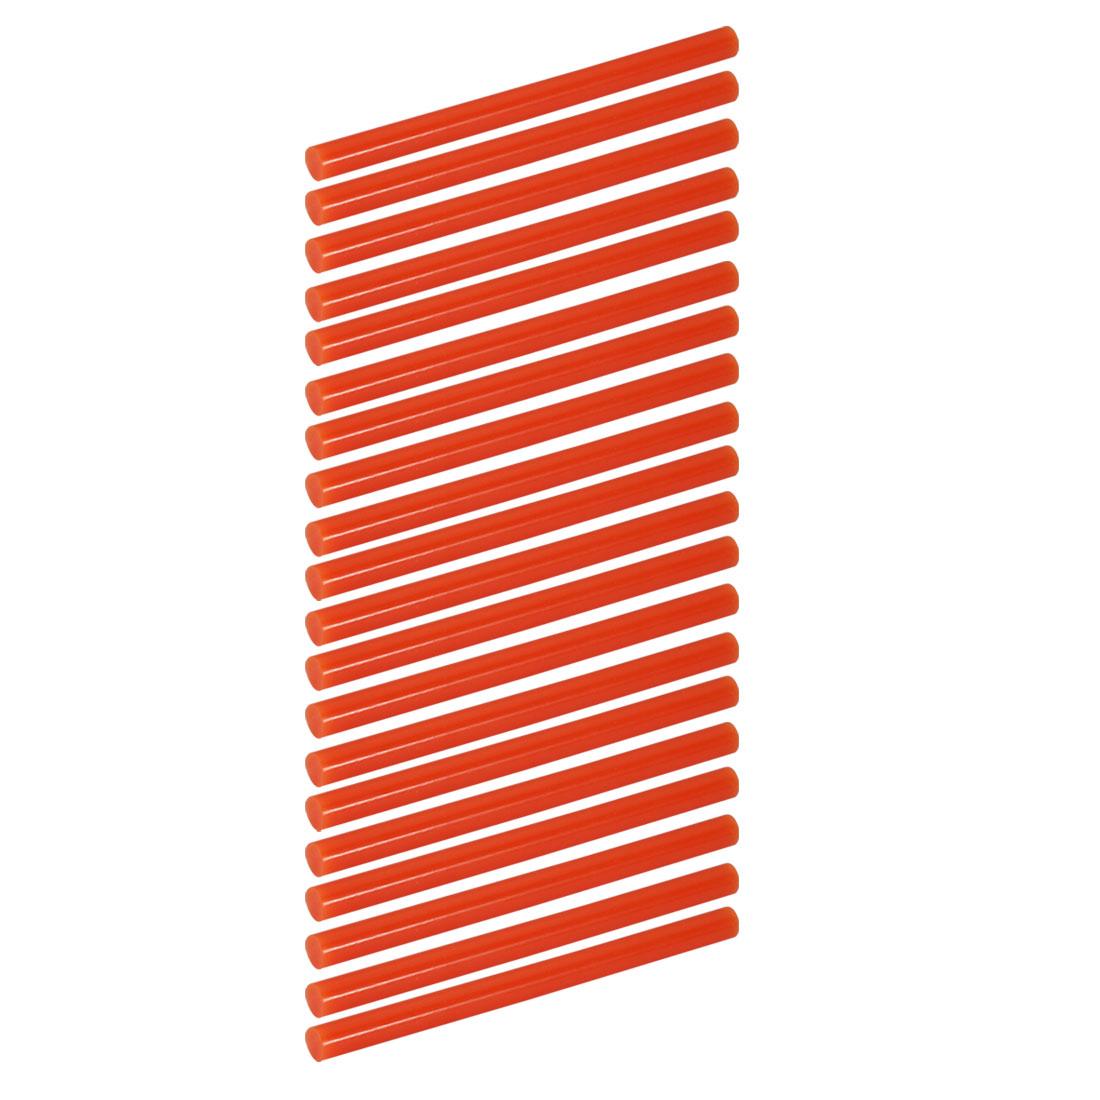 20pcs 7mm Dia 100mm Long Hot Melt Glue Adhesive Stick Orange